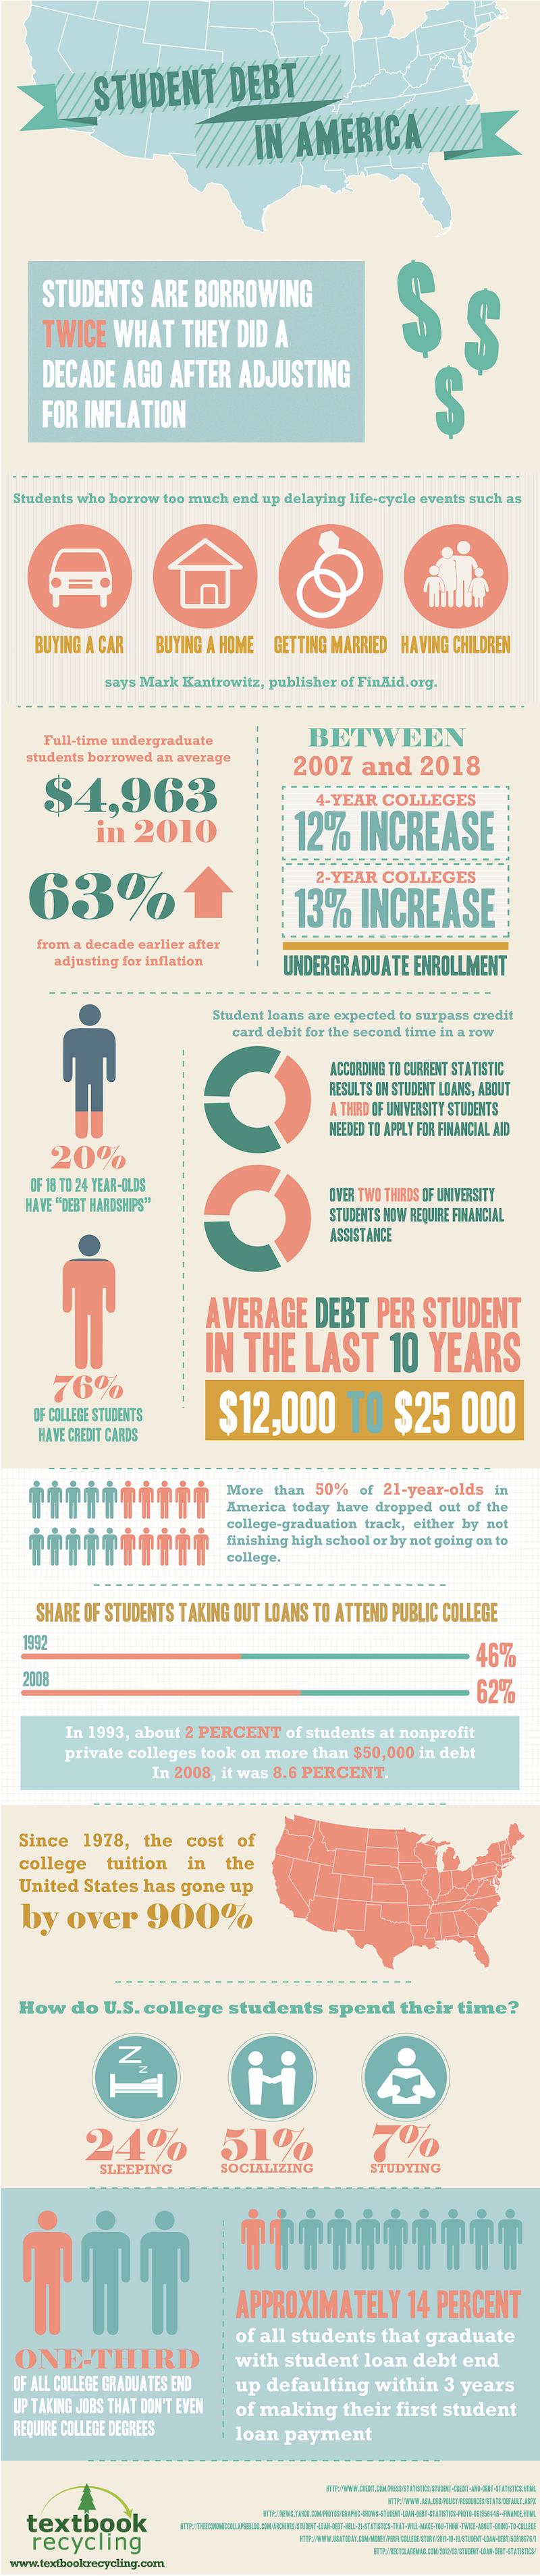 Average Student Debt in America